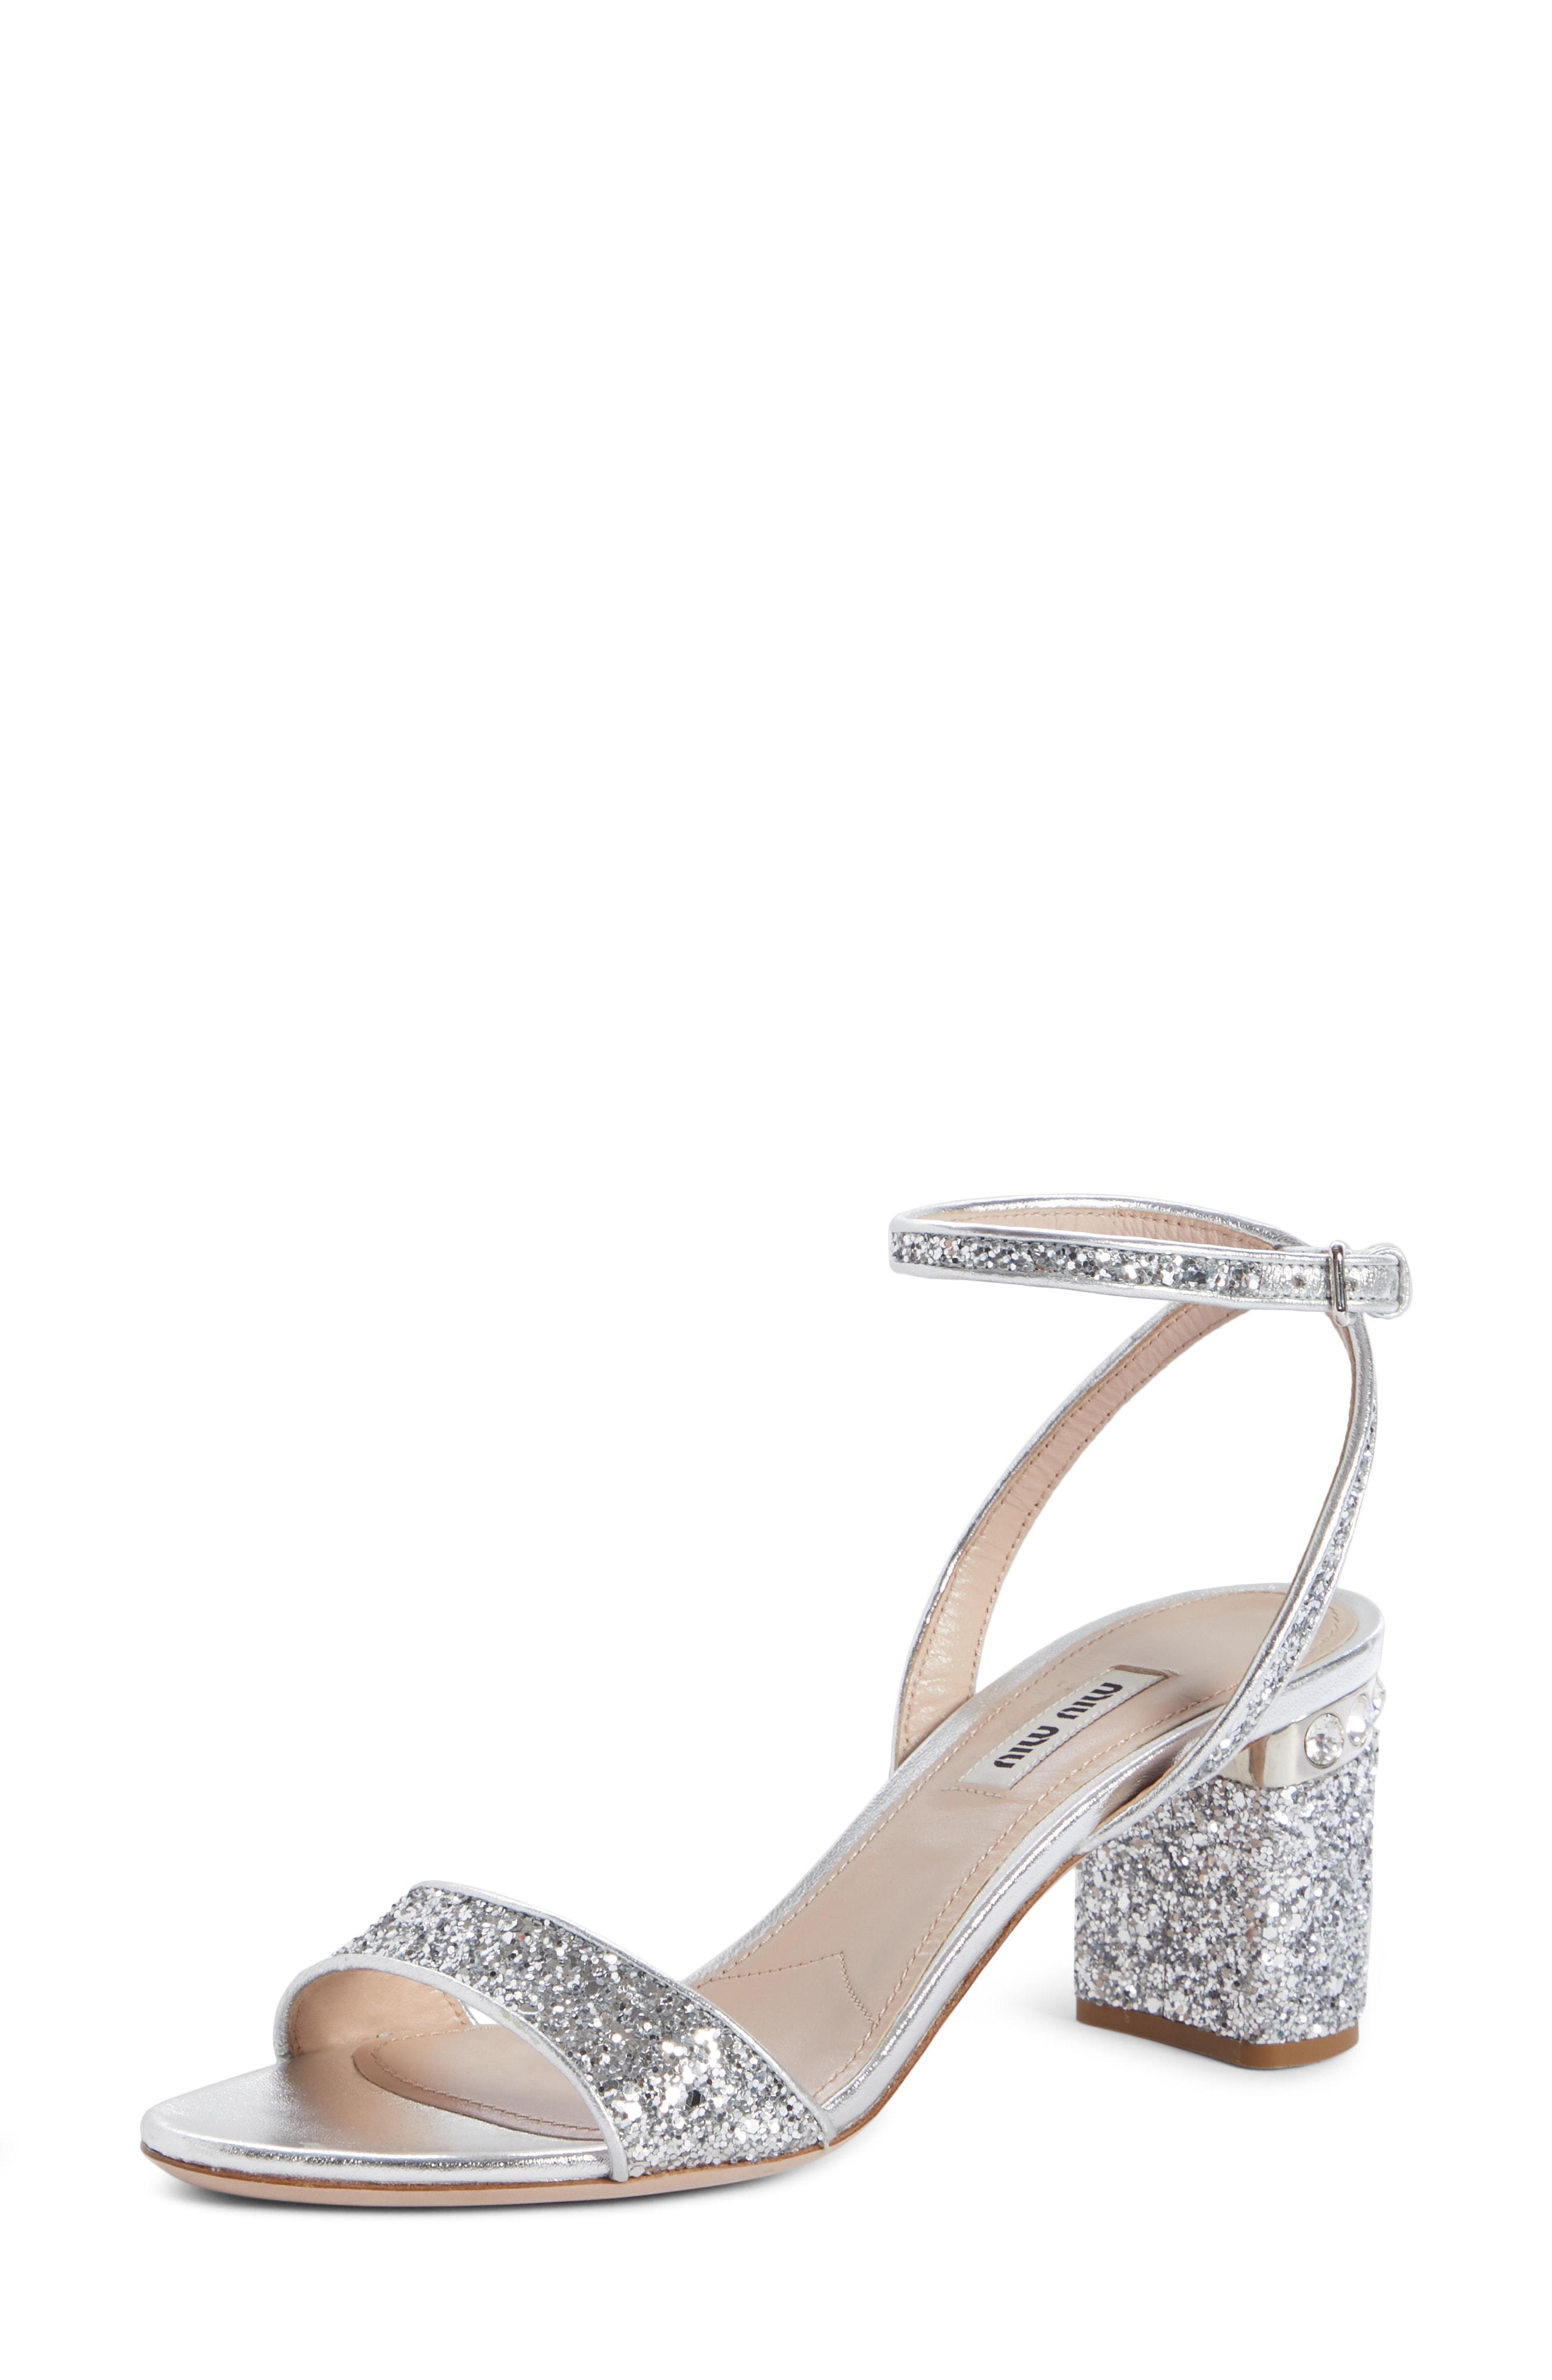 86f8beb8eceb Store Status Price. Miu Miu Glitter Crystal-Embellished Block-Heel Sandals  In Silver